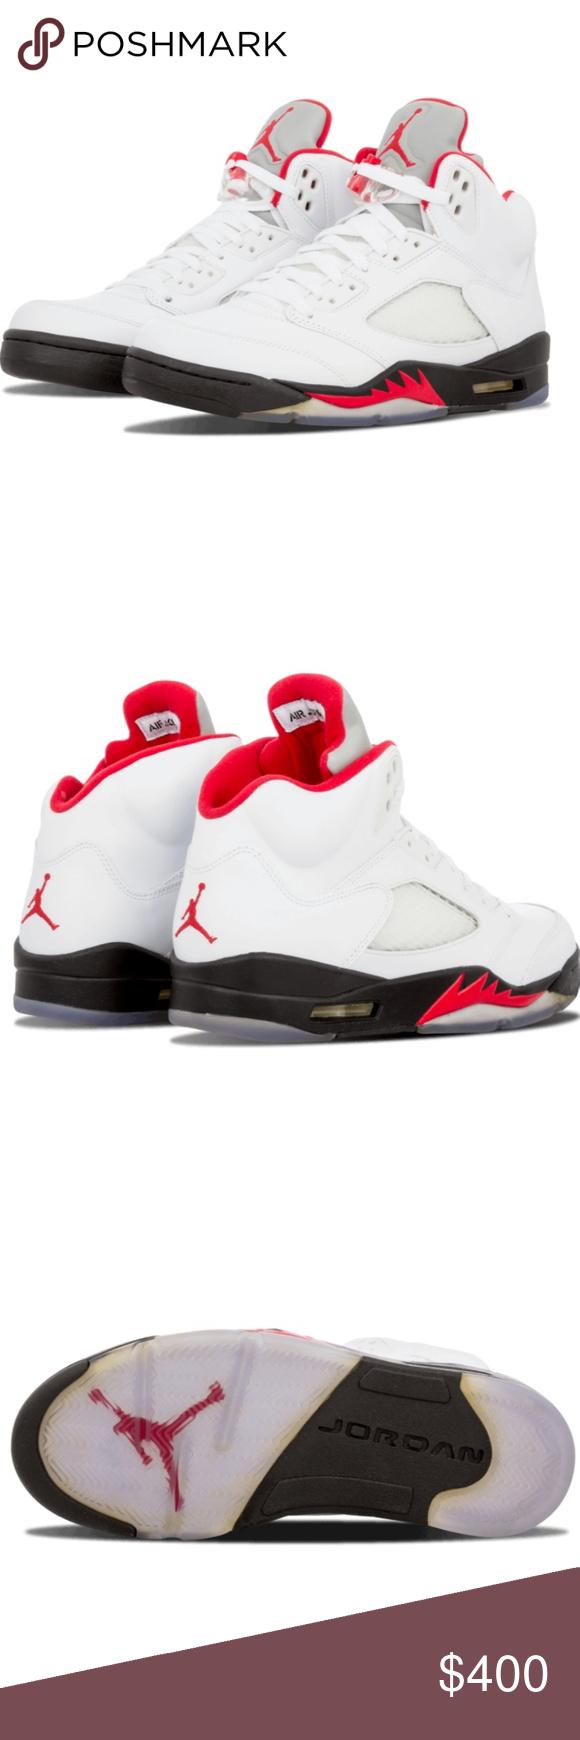 Nike Air Jordans Retro 5 V fire (Mens size 7) NWT